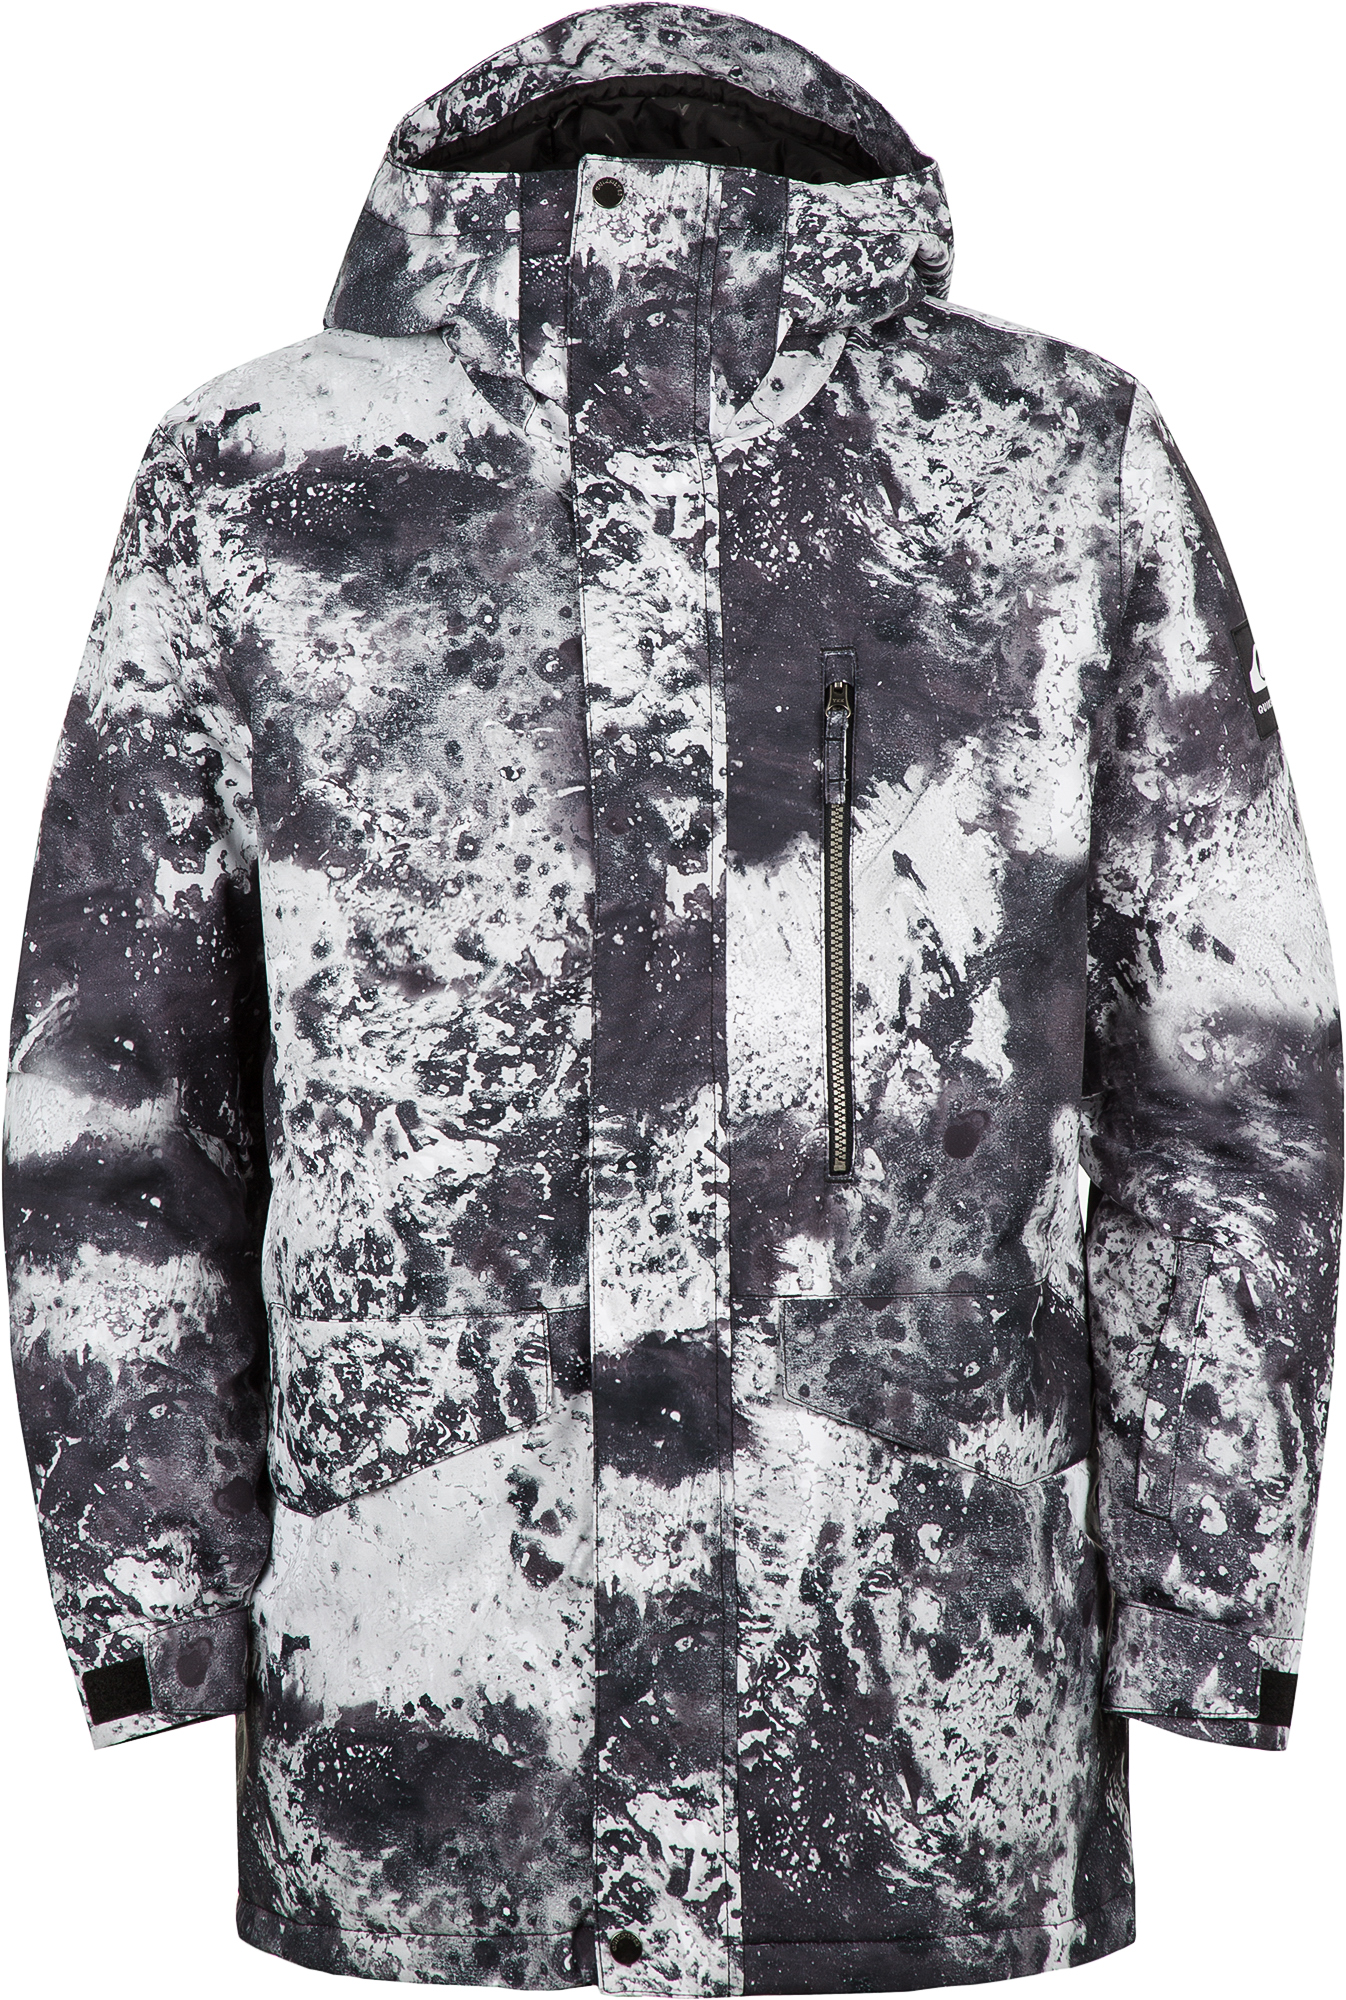 цена Quiksilver Куртка утепленная мужская Quiksilver Mission Printed Jk, размер 46-48 онлайн в 2017 году